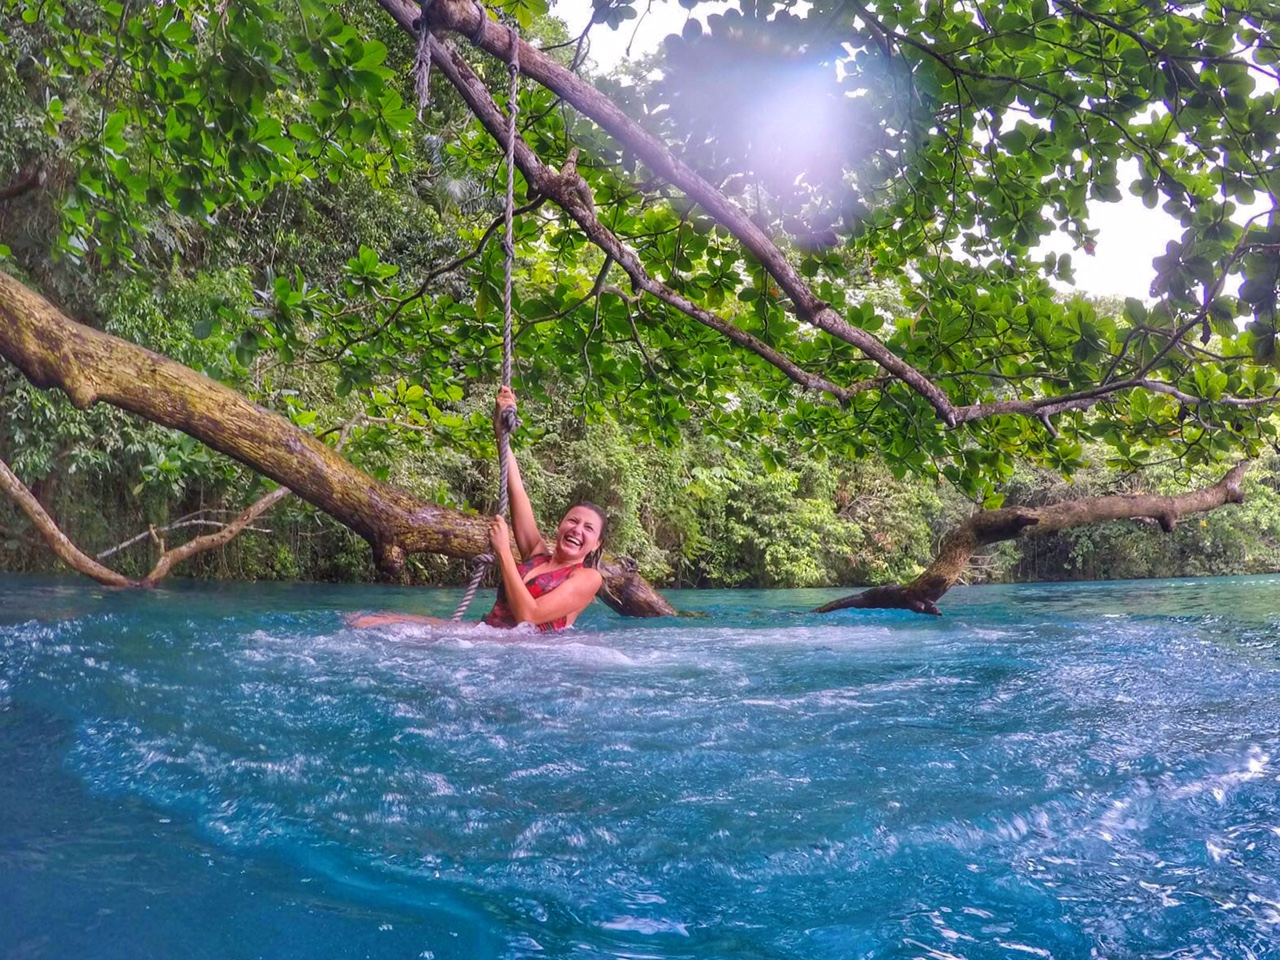 blue-lagoon-lagoa-azul-port-antonio-portland-jamaica-dicas-praias-15